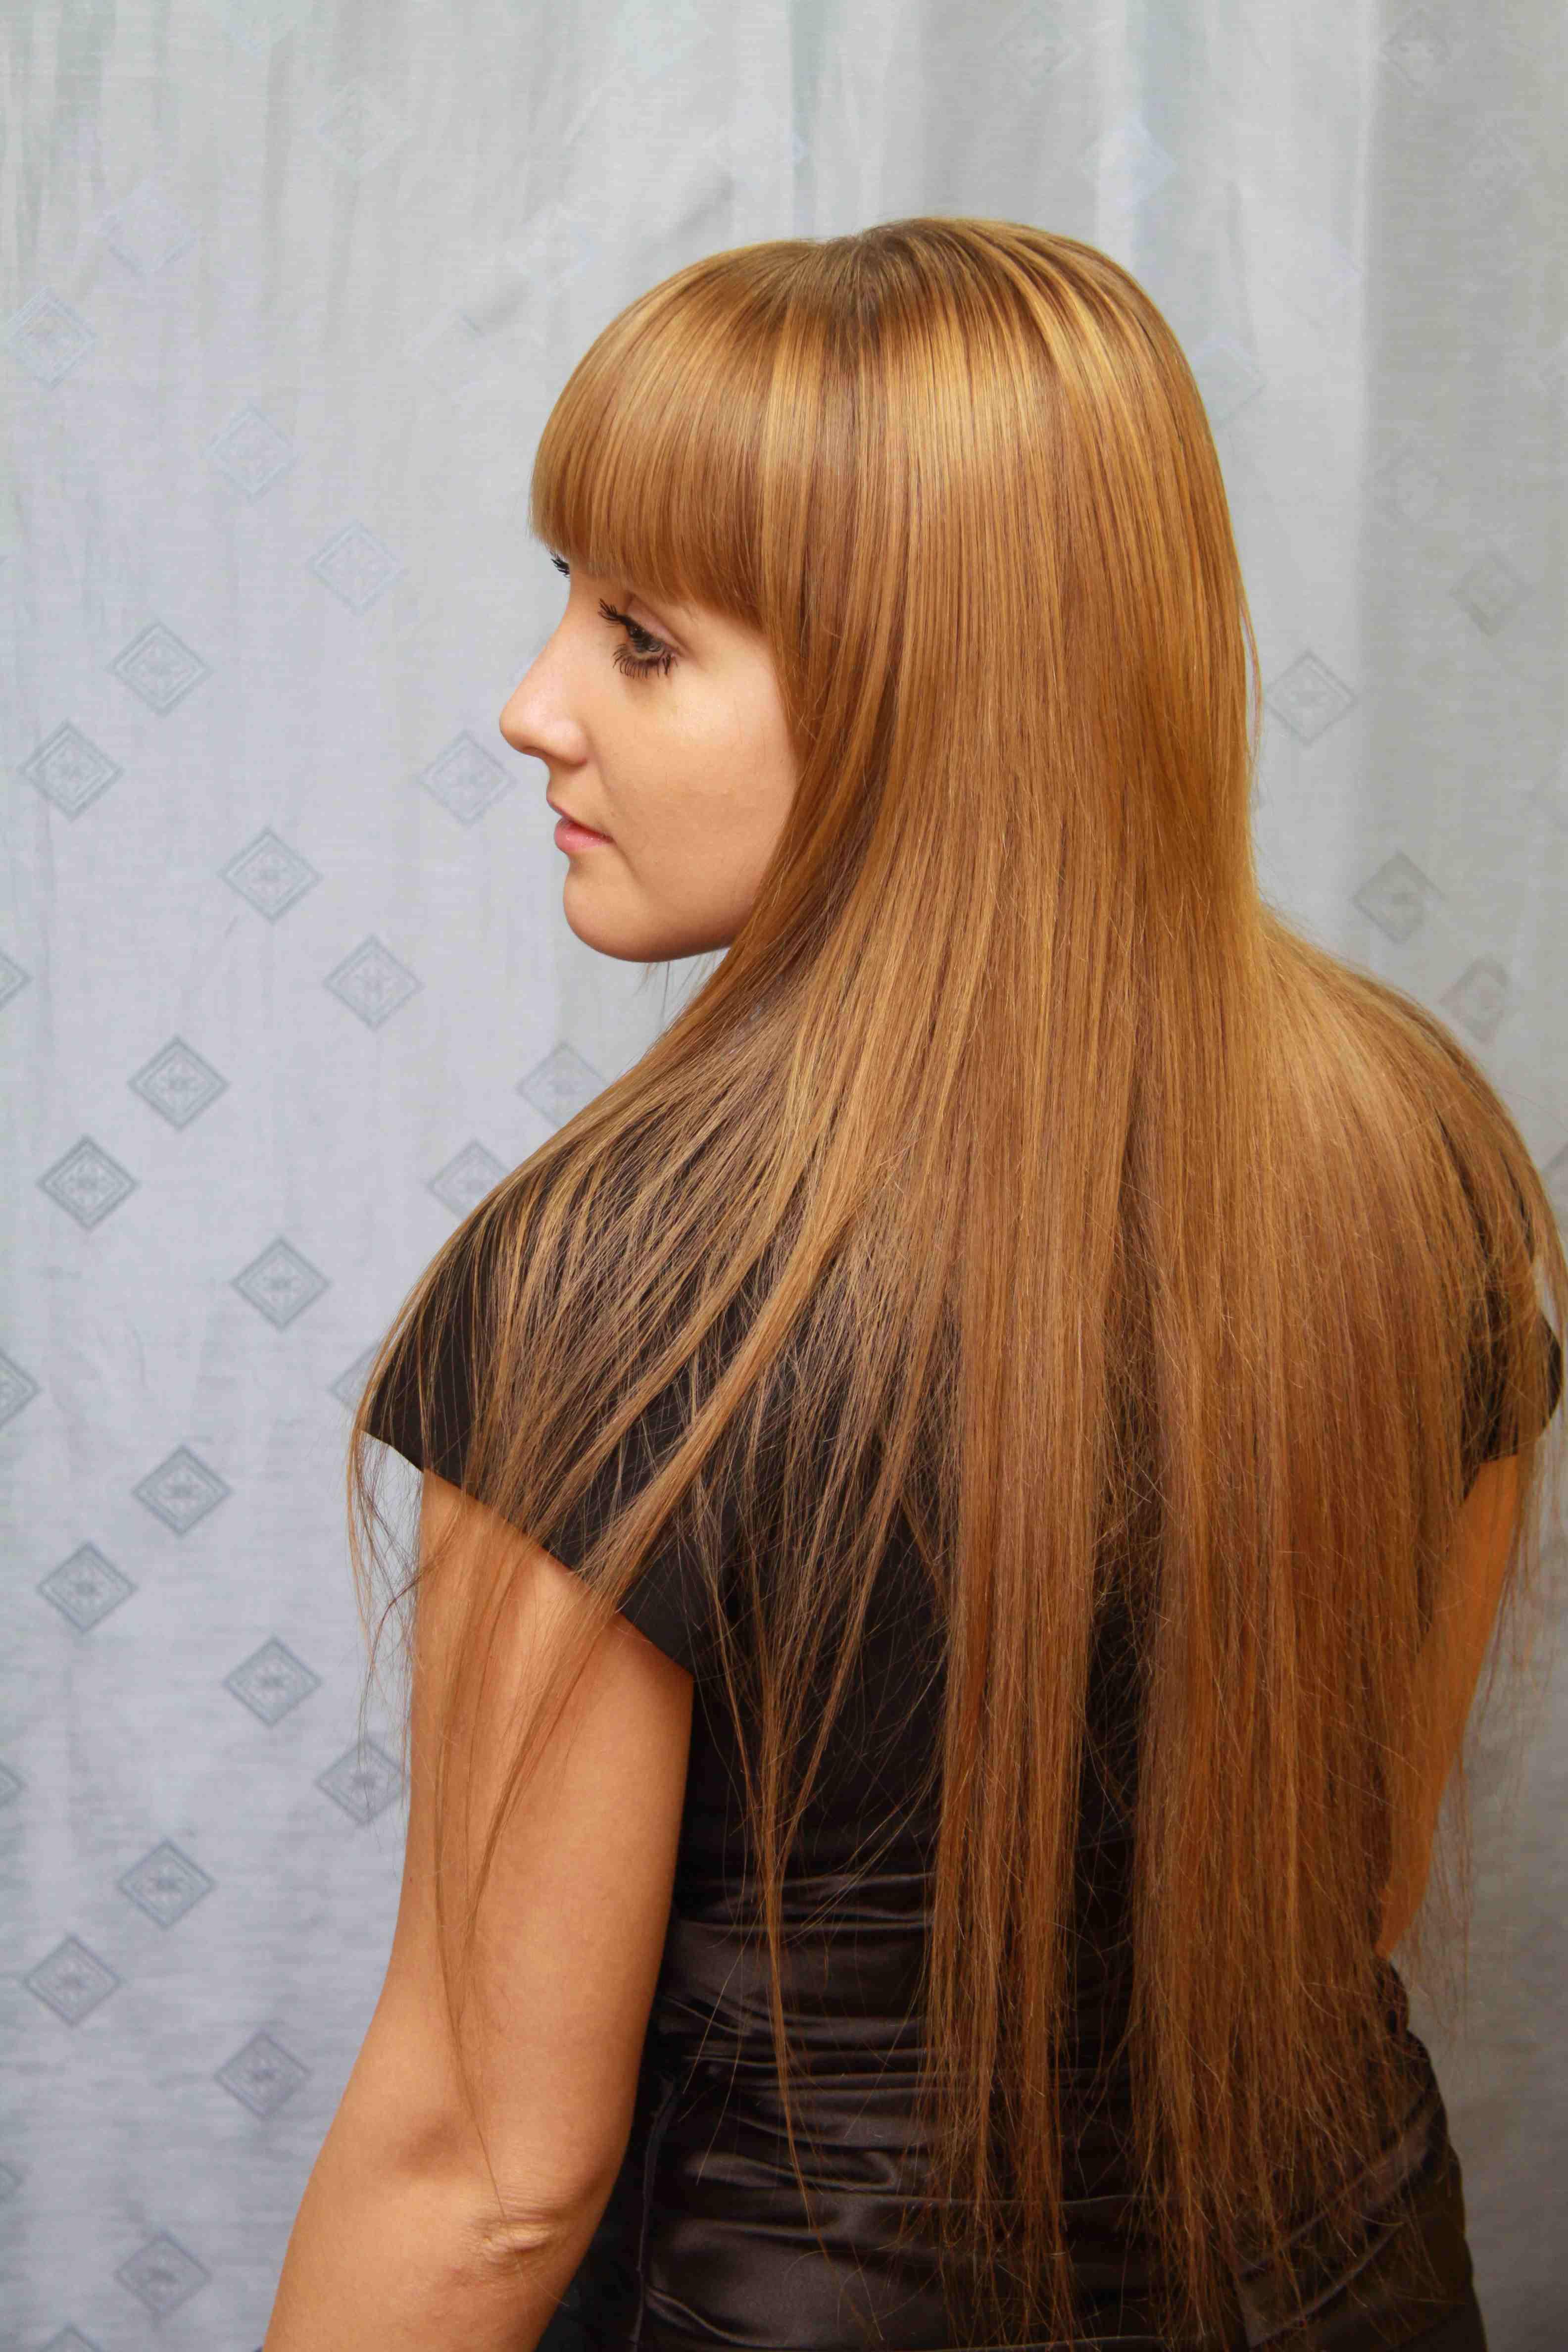 Проститутка москва за 500 руб 22 фотография